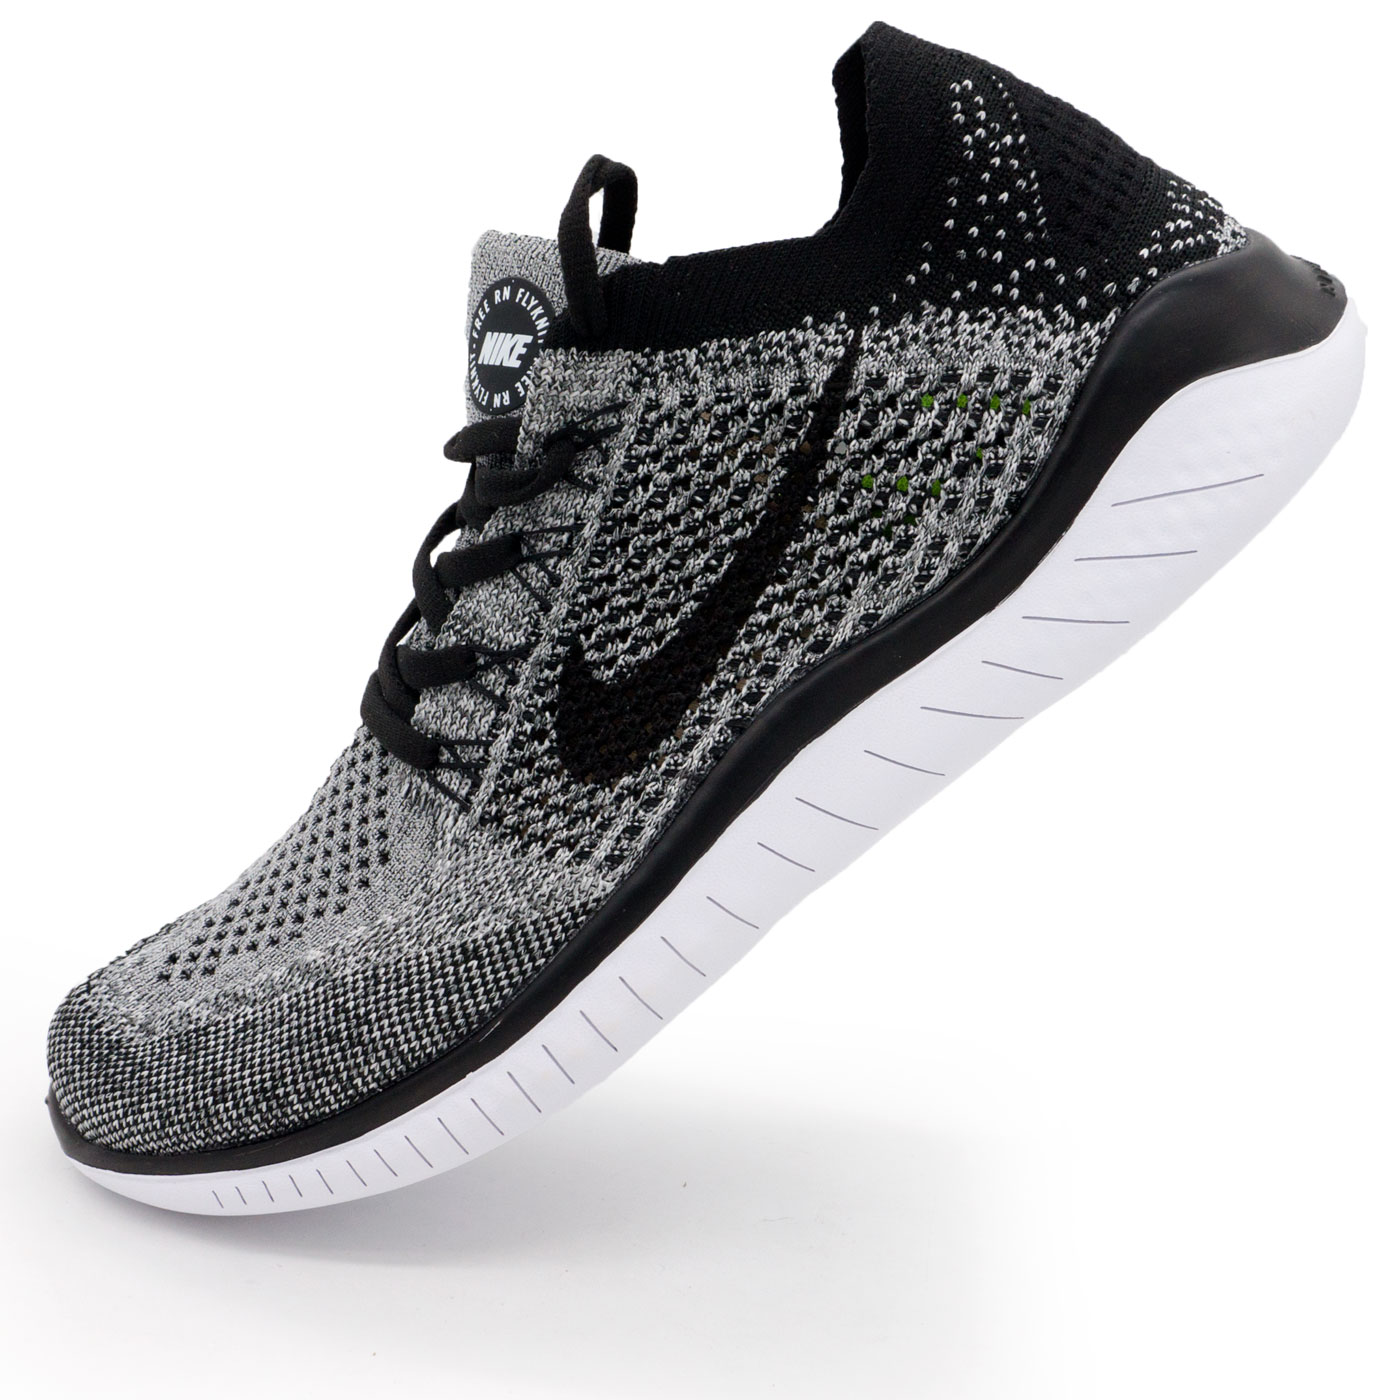 фото main Кроссовки для бега Nike Free Run Flyknit Найк Фри Ран, серые main